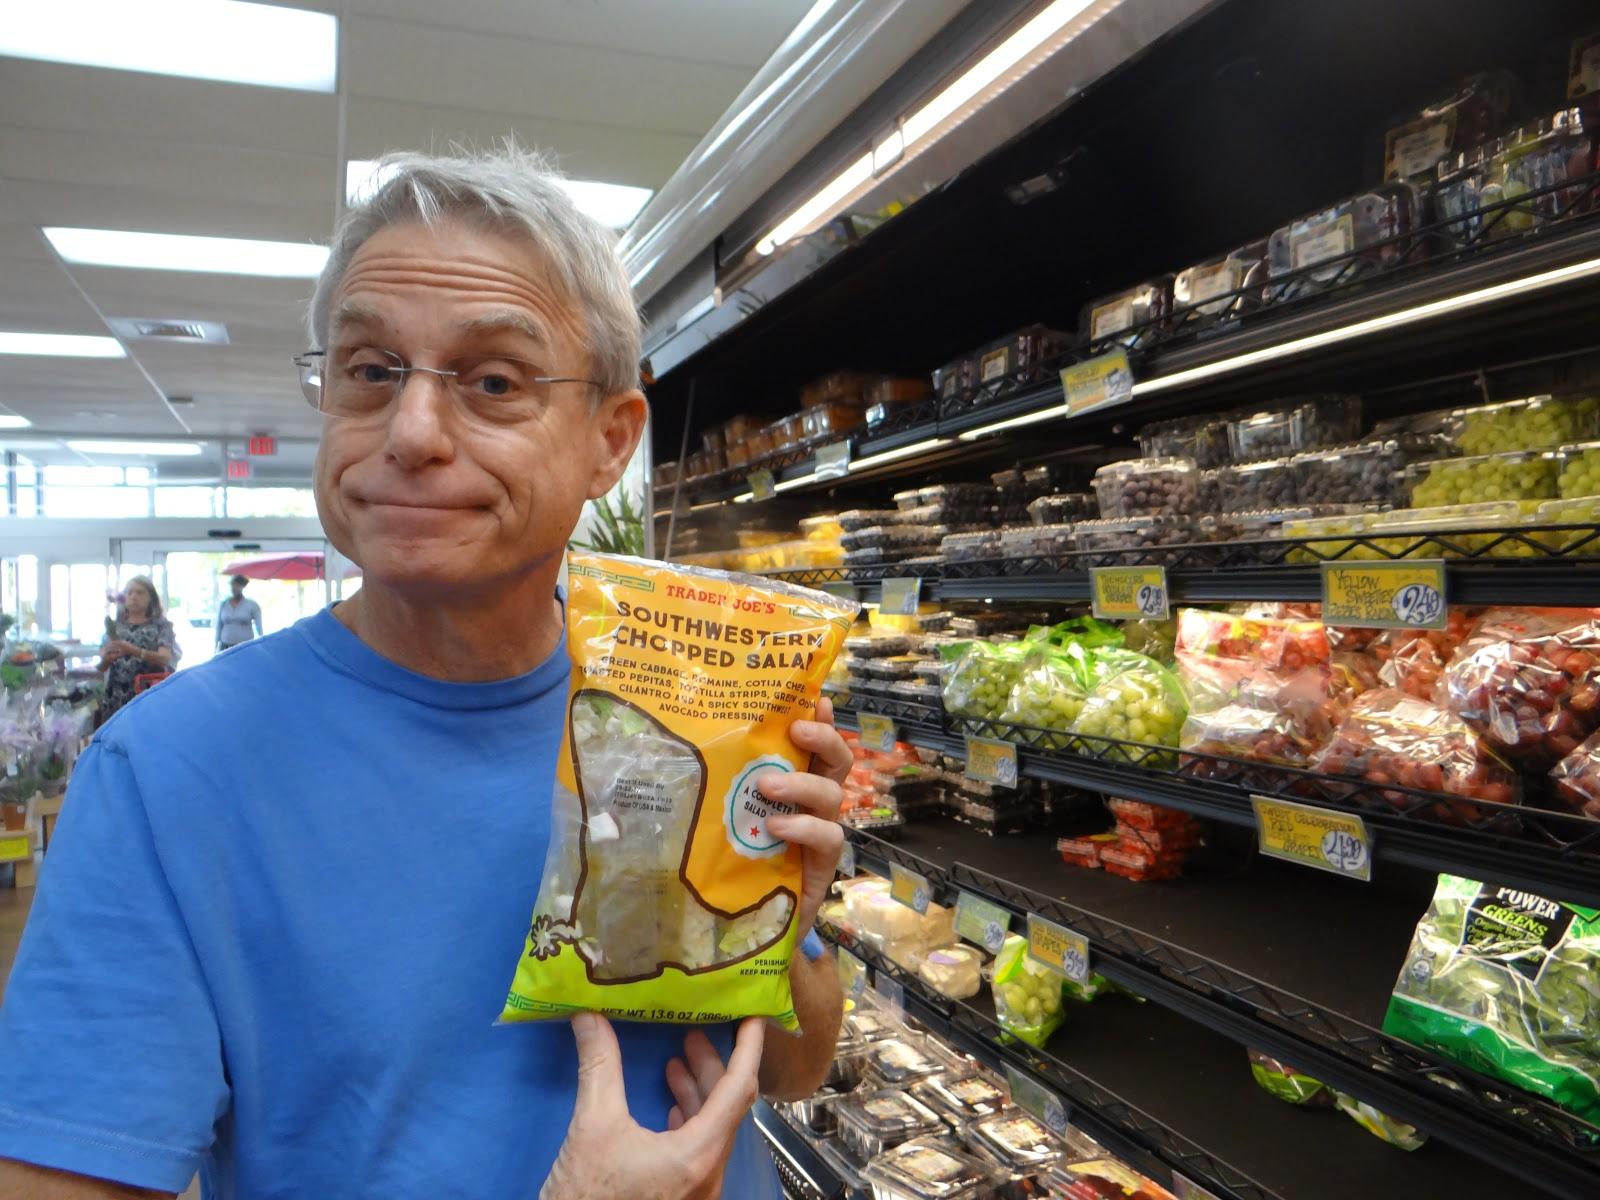 Trader Joe's 365: Southwestern Chopped Salad